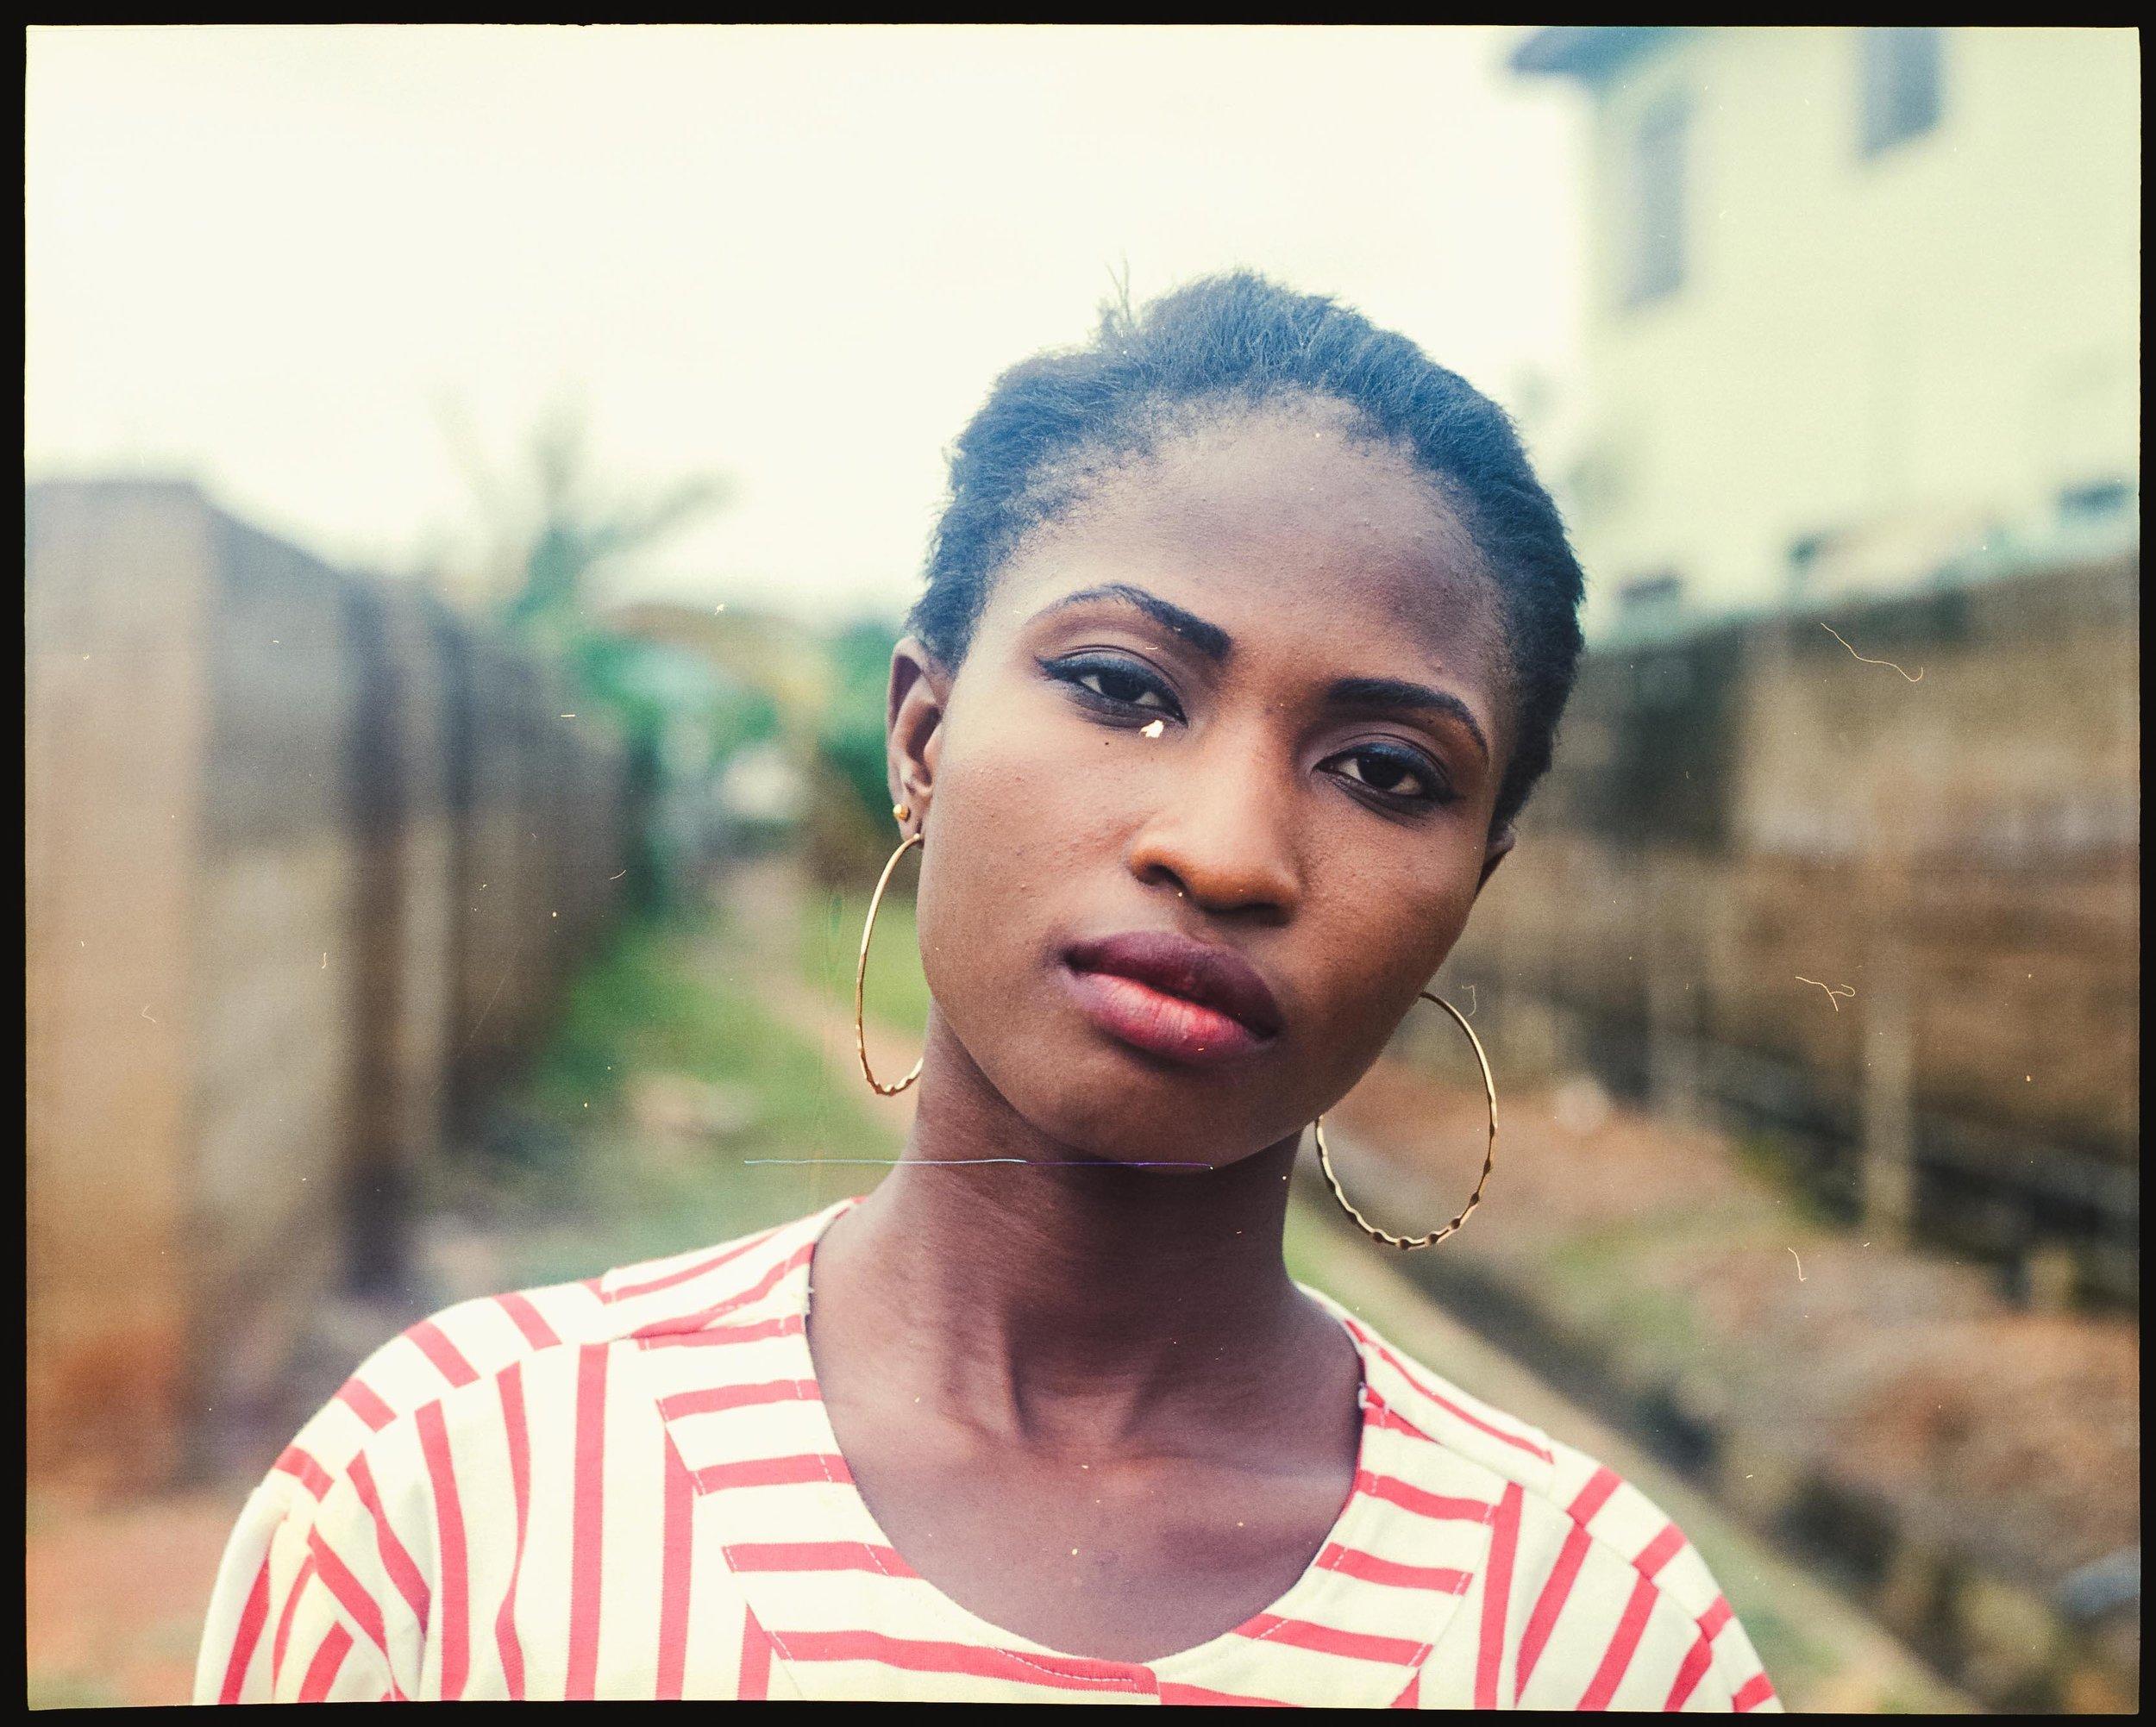 Ghana_Lookbook (63).jpg